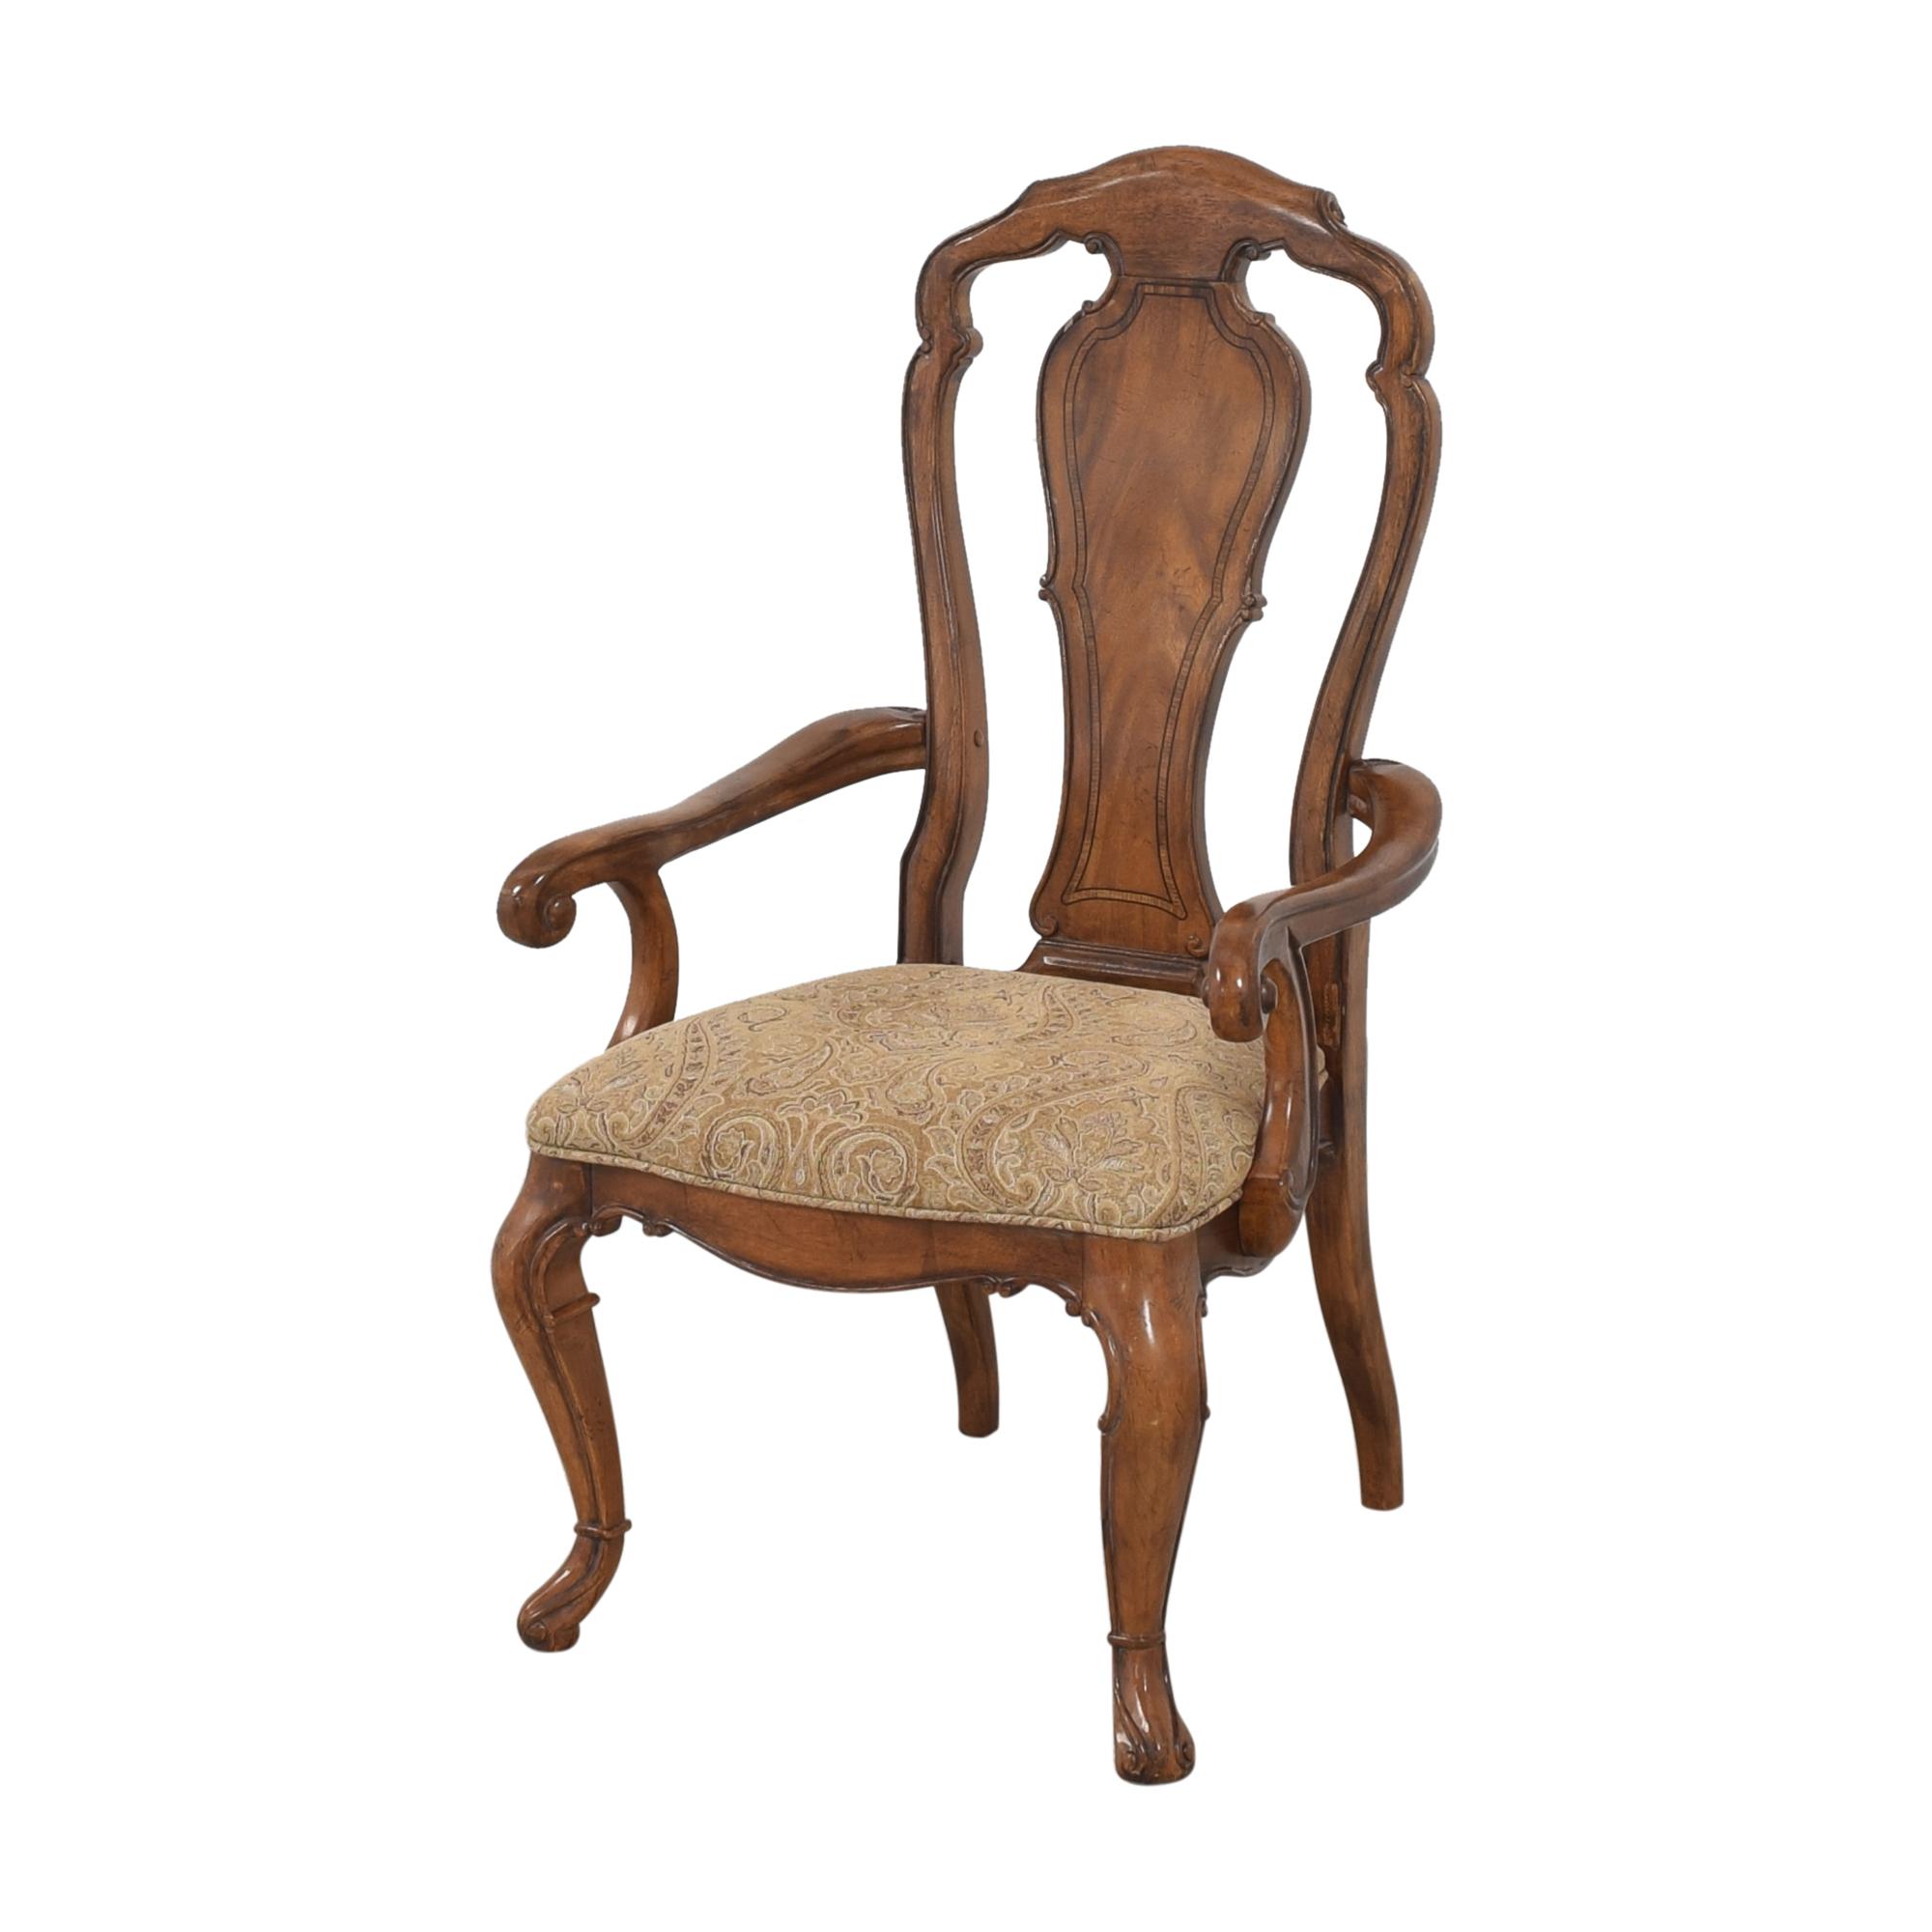 Thomasville Ernest Hemingway Granada Dining Arm Chairs / Chairs